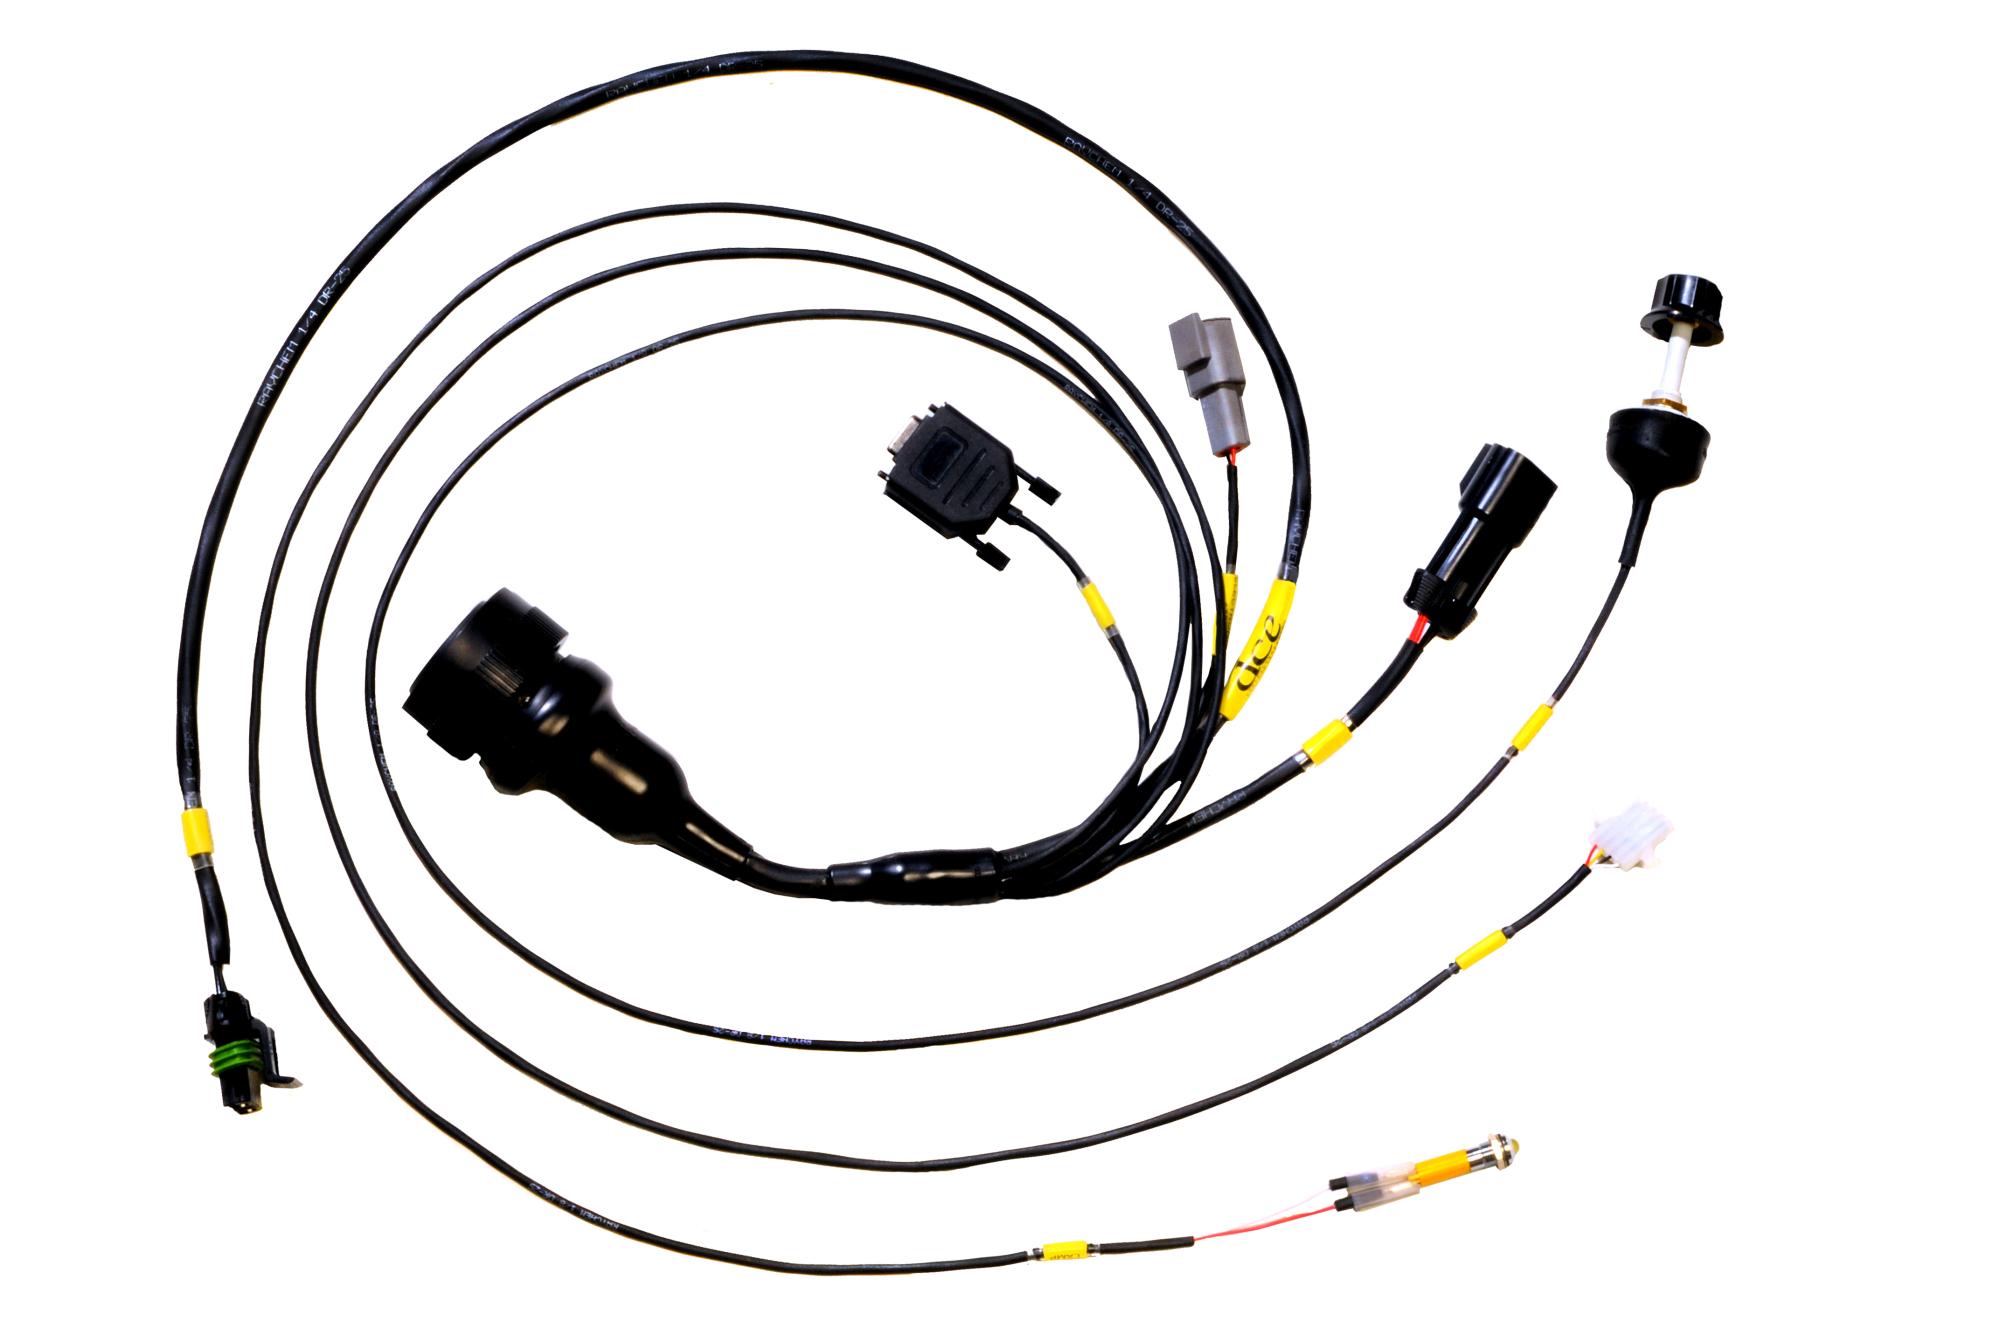 Epas106 Pro Race Wiring Harness